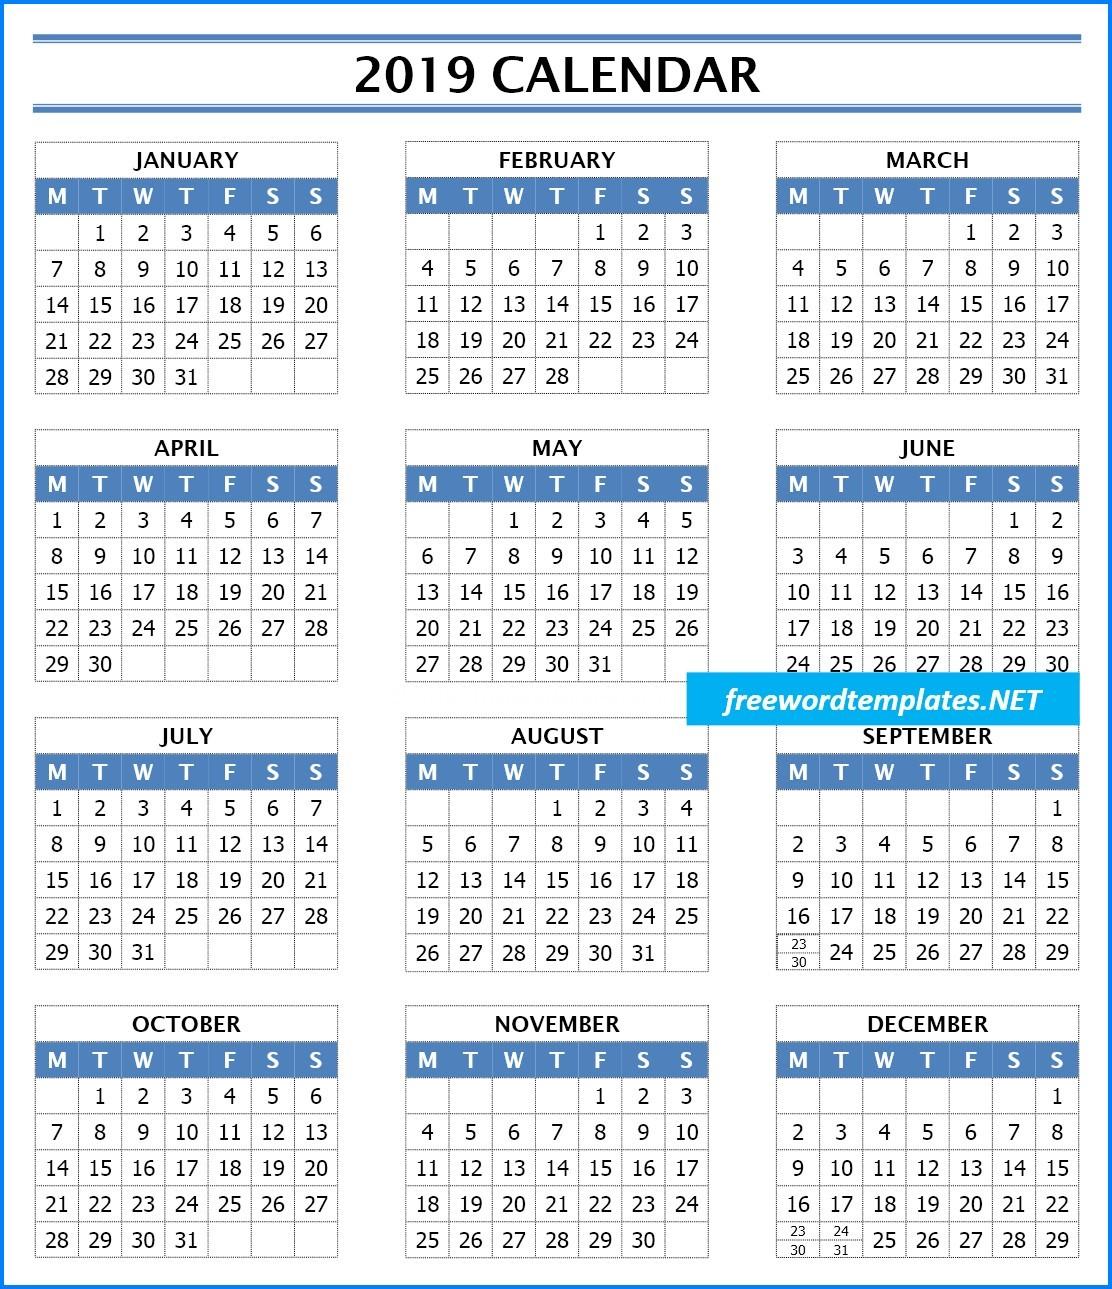 2019 Calendar Templates